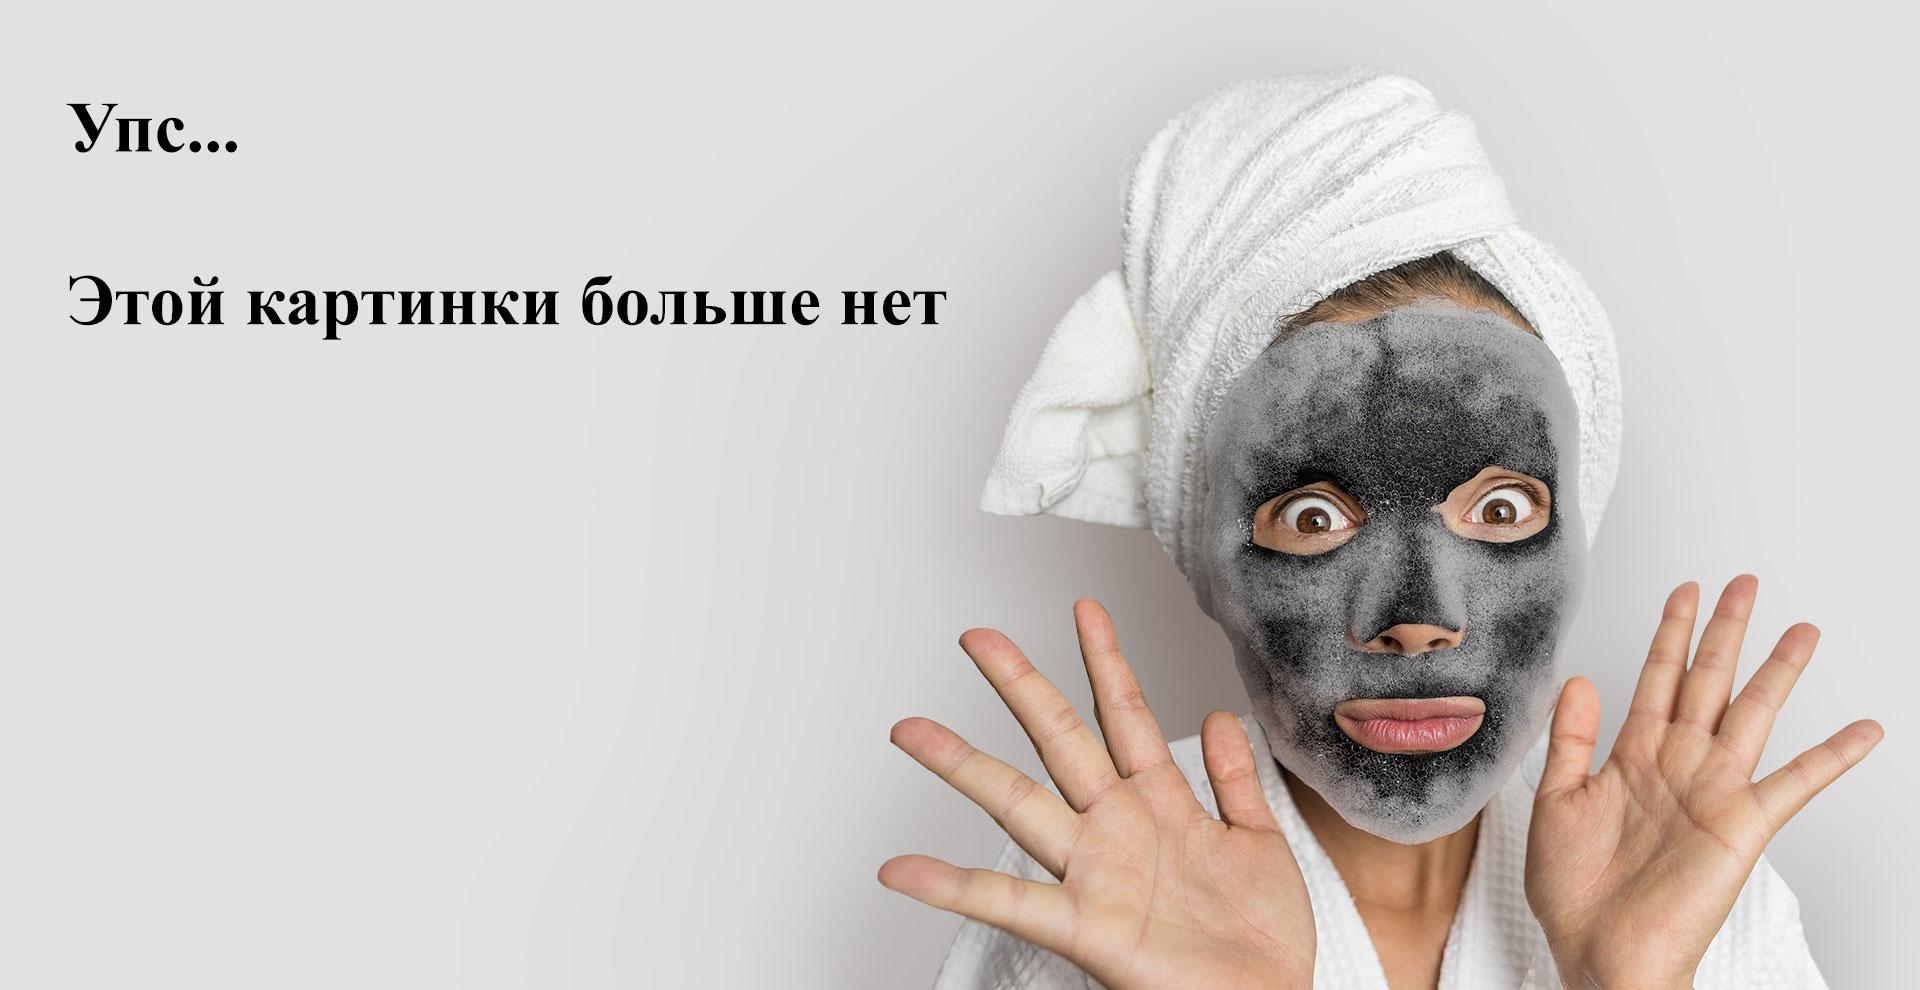 Shary, Пенка Anti-Wrinkle, разглаживающая, 100 мл